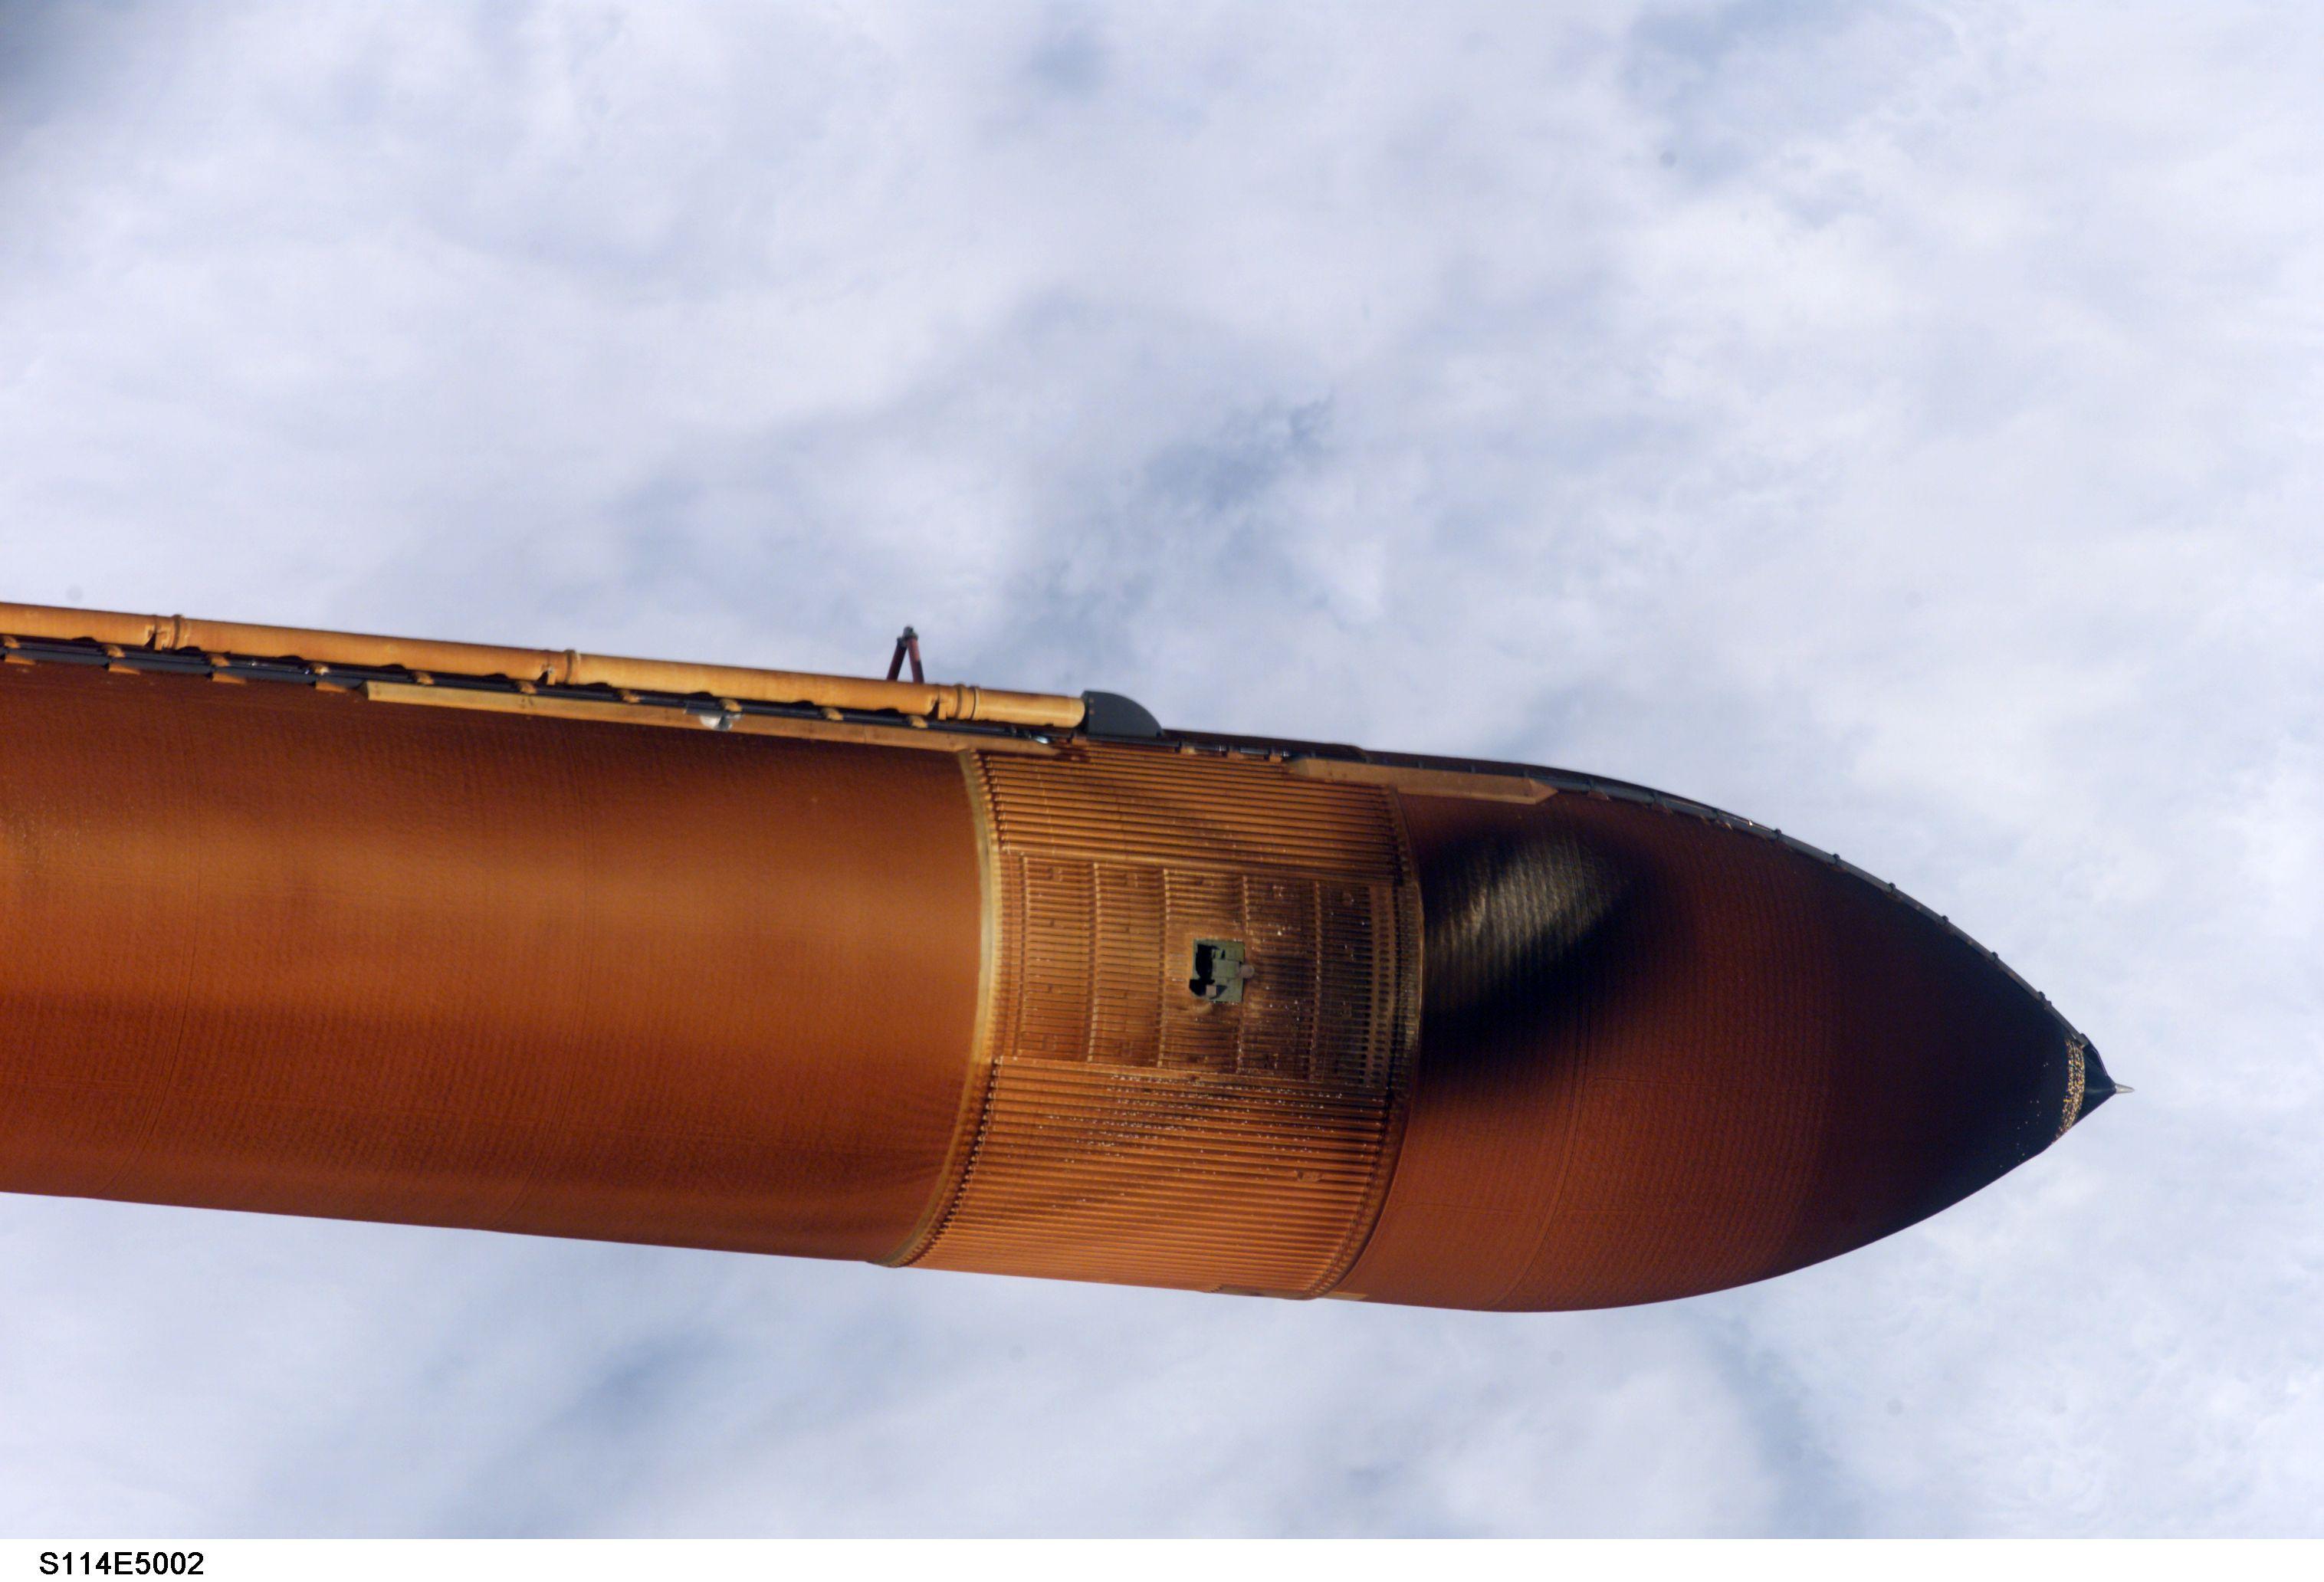 nasa space shuttle gas tank - photo #28